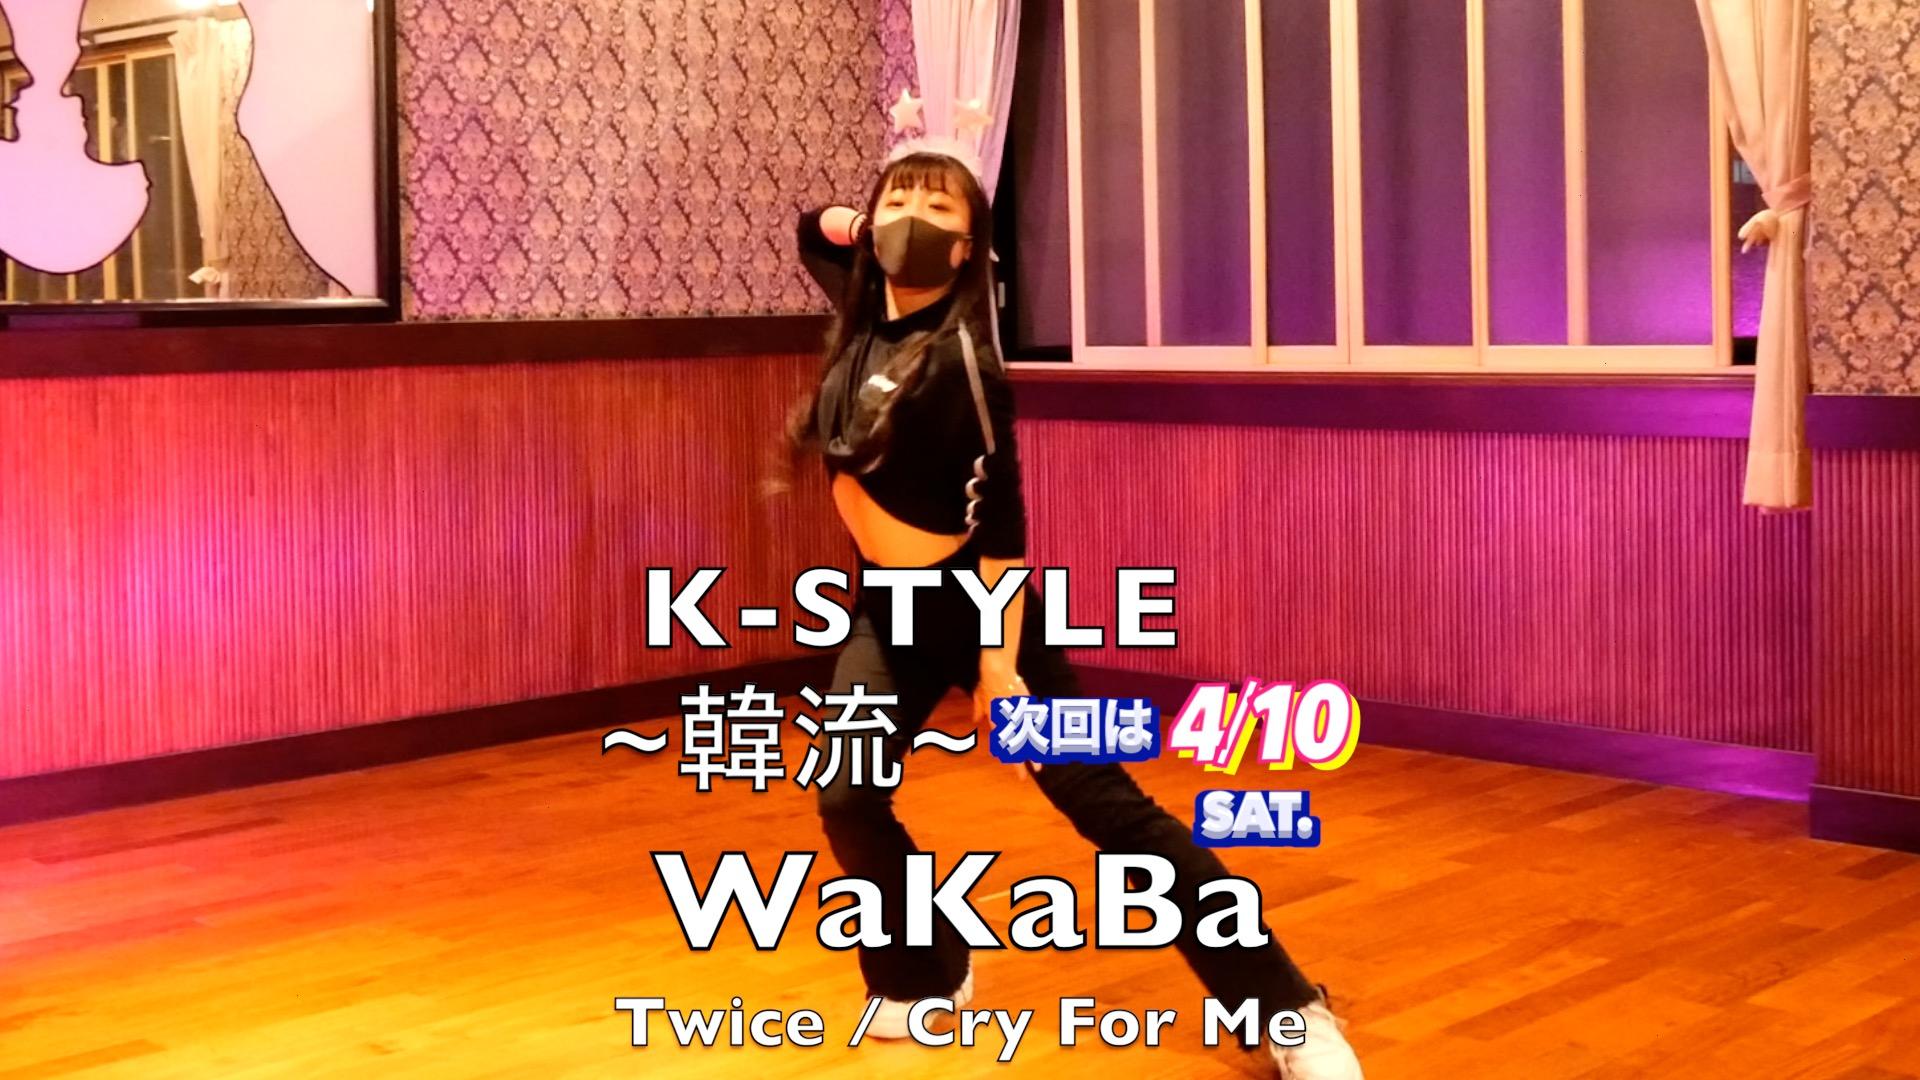 【K-STYLE~韓流~】振付を練習してレッスンに参加しよう(4月10日土曜用)